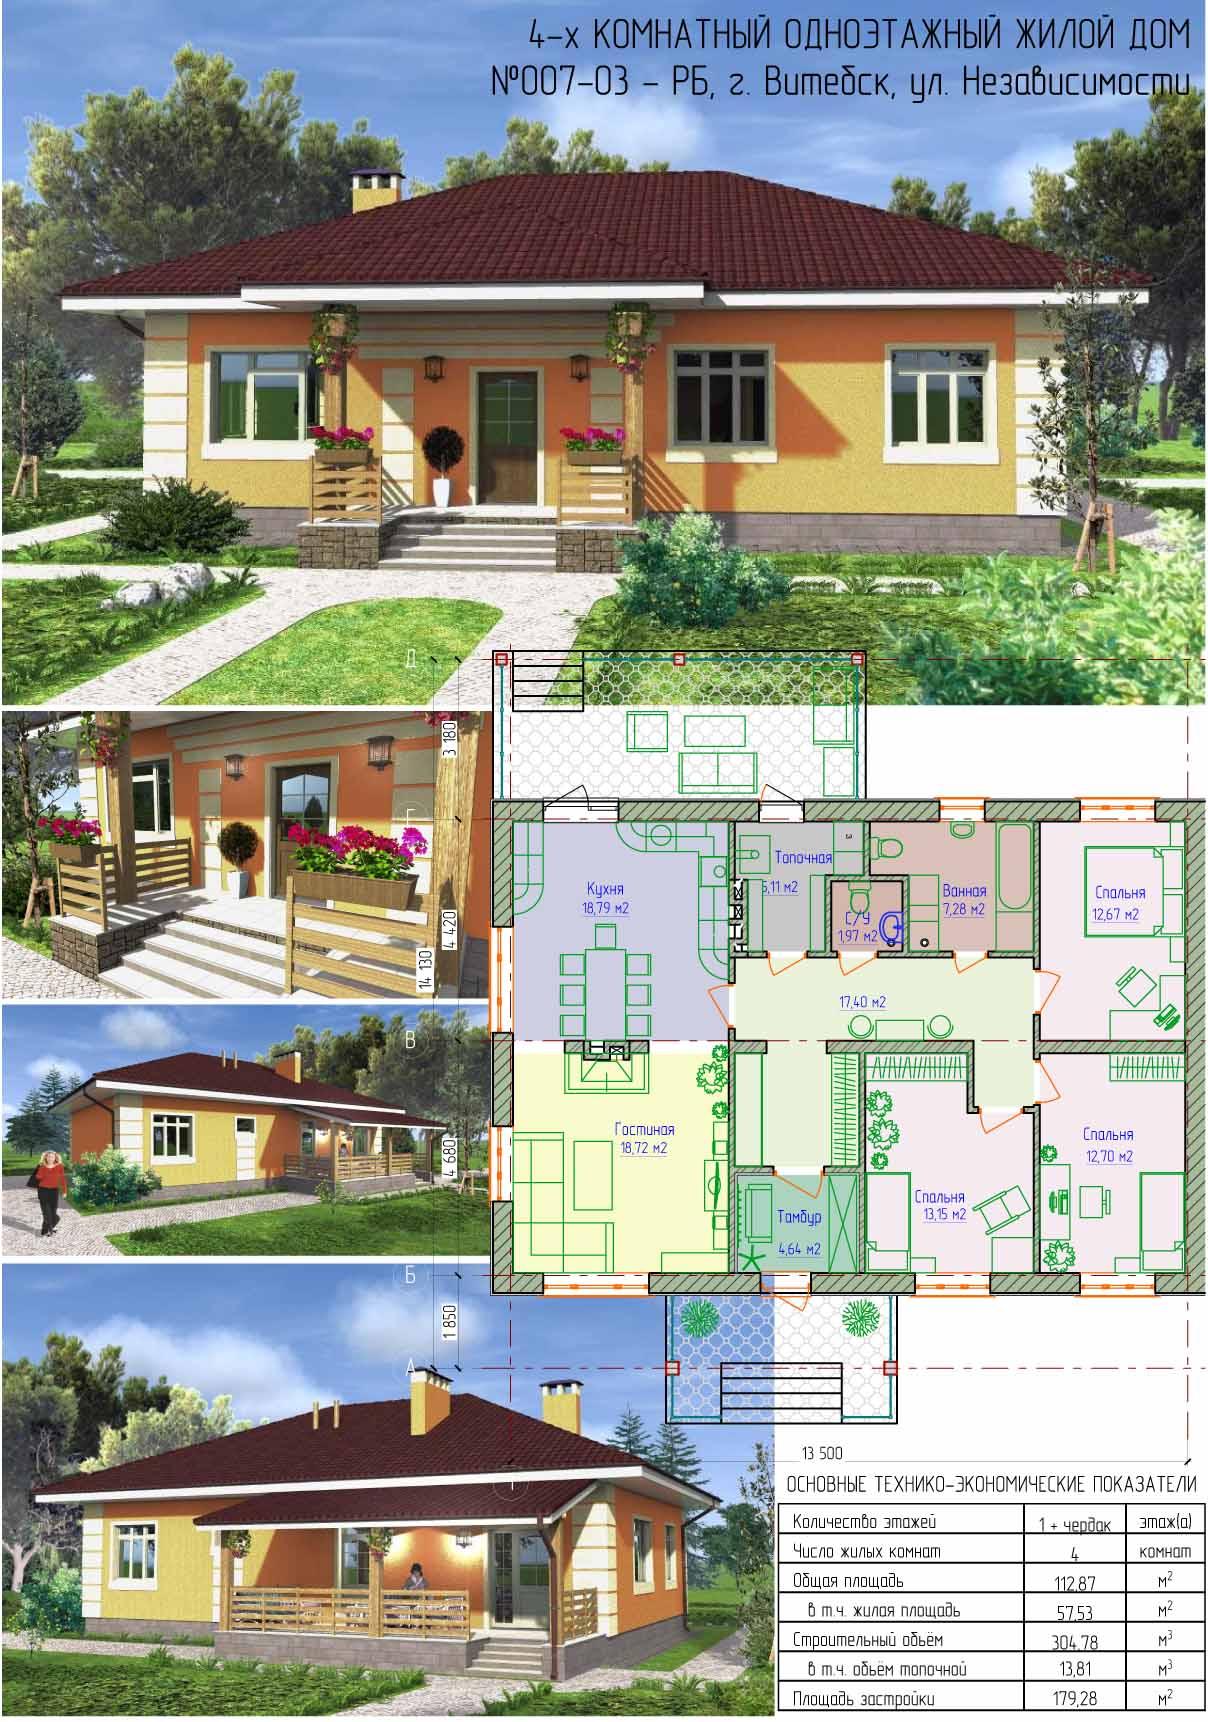 проекты одноэтажных домов 4 х комнатных